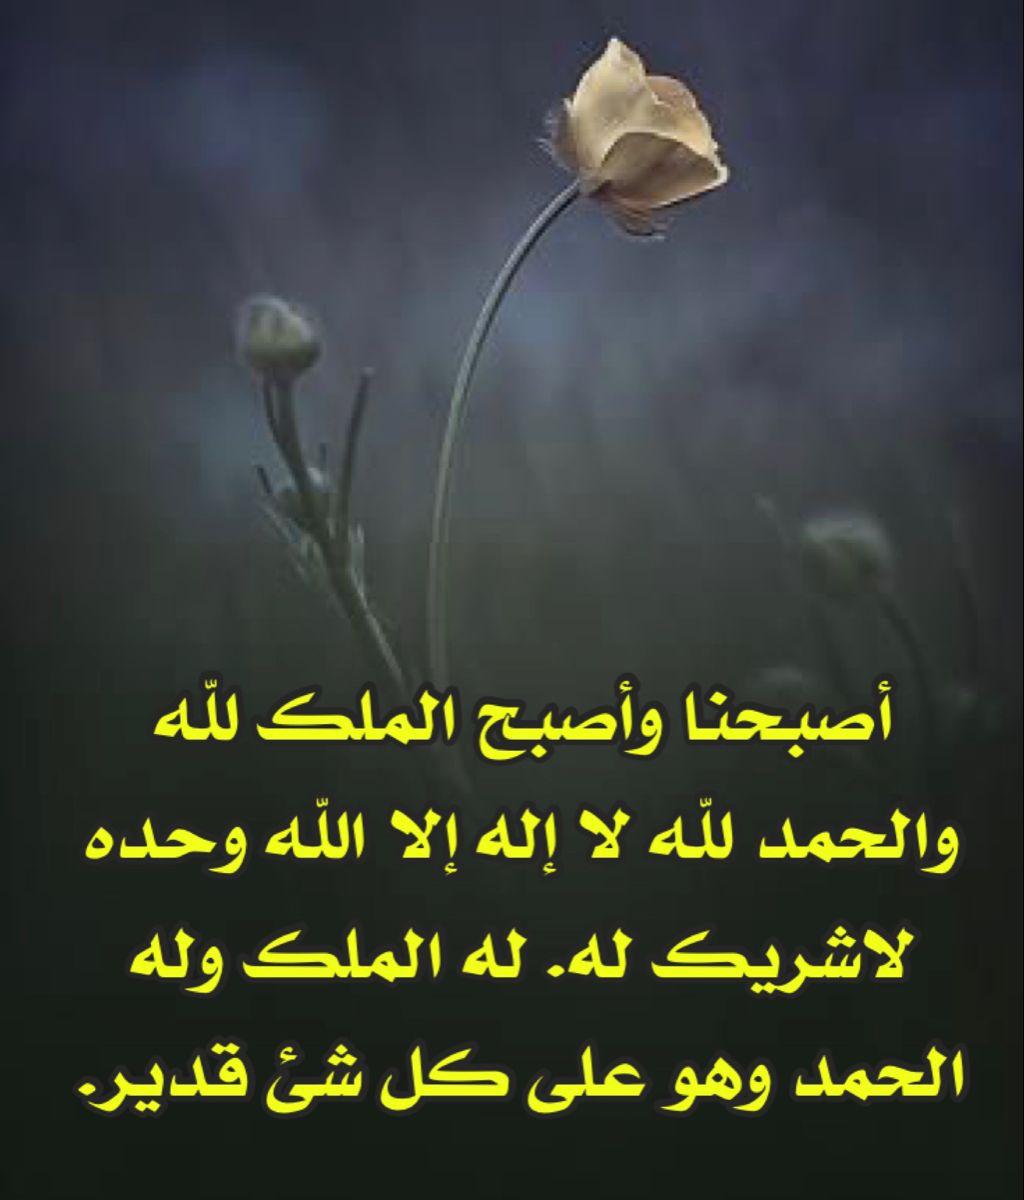 د ع اء الصباح Arabic Quotes Quotes